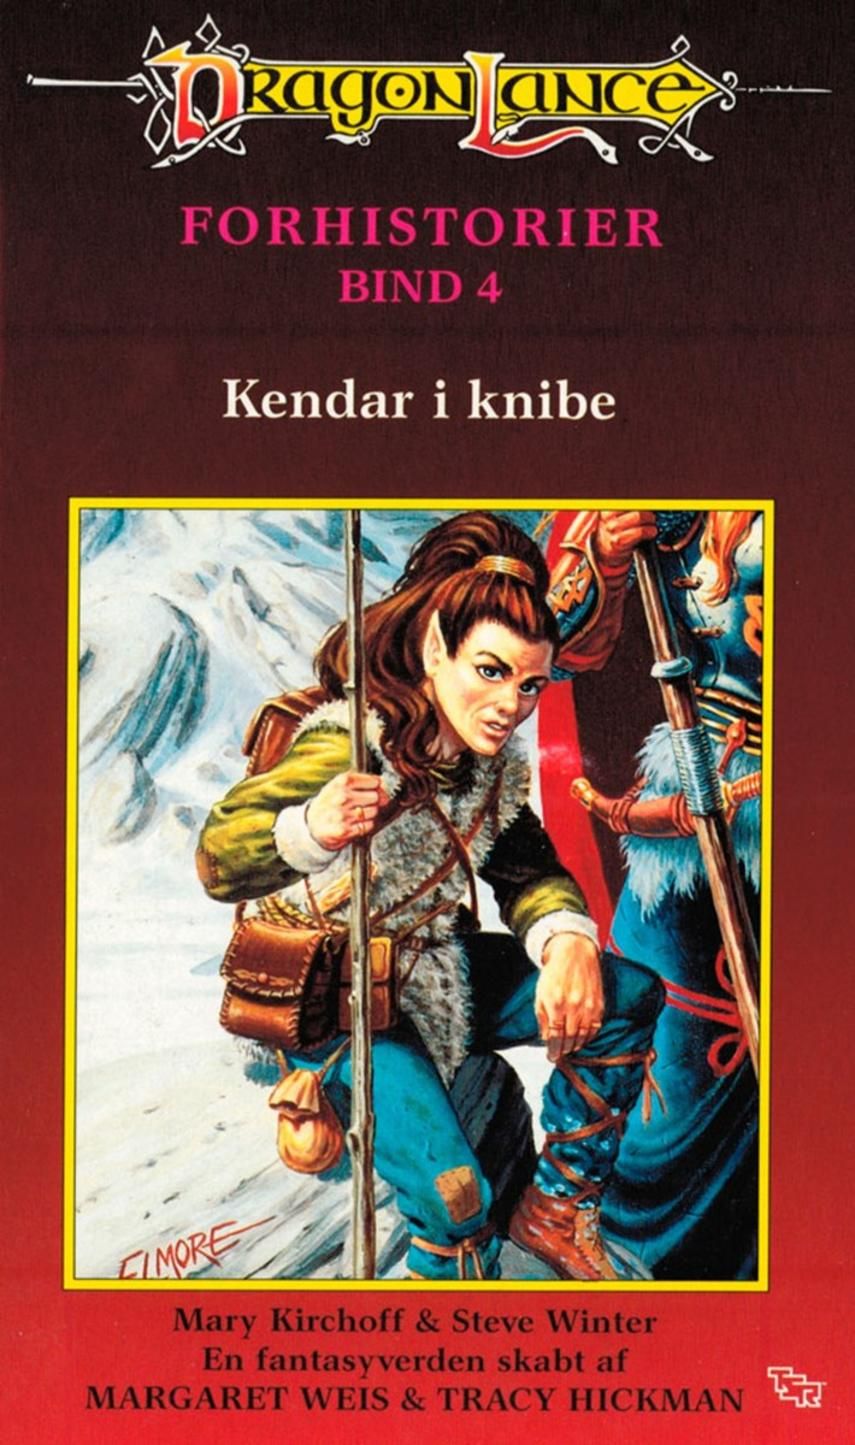 Mary Kirchoff, Steve Winter: Kendar i knibe